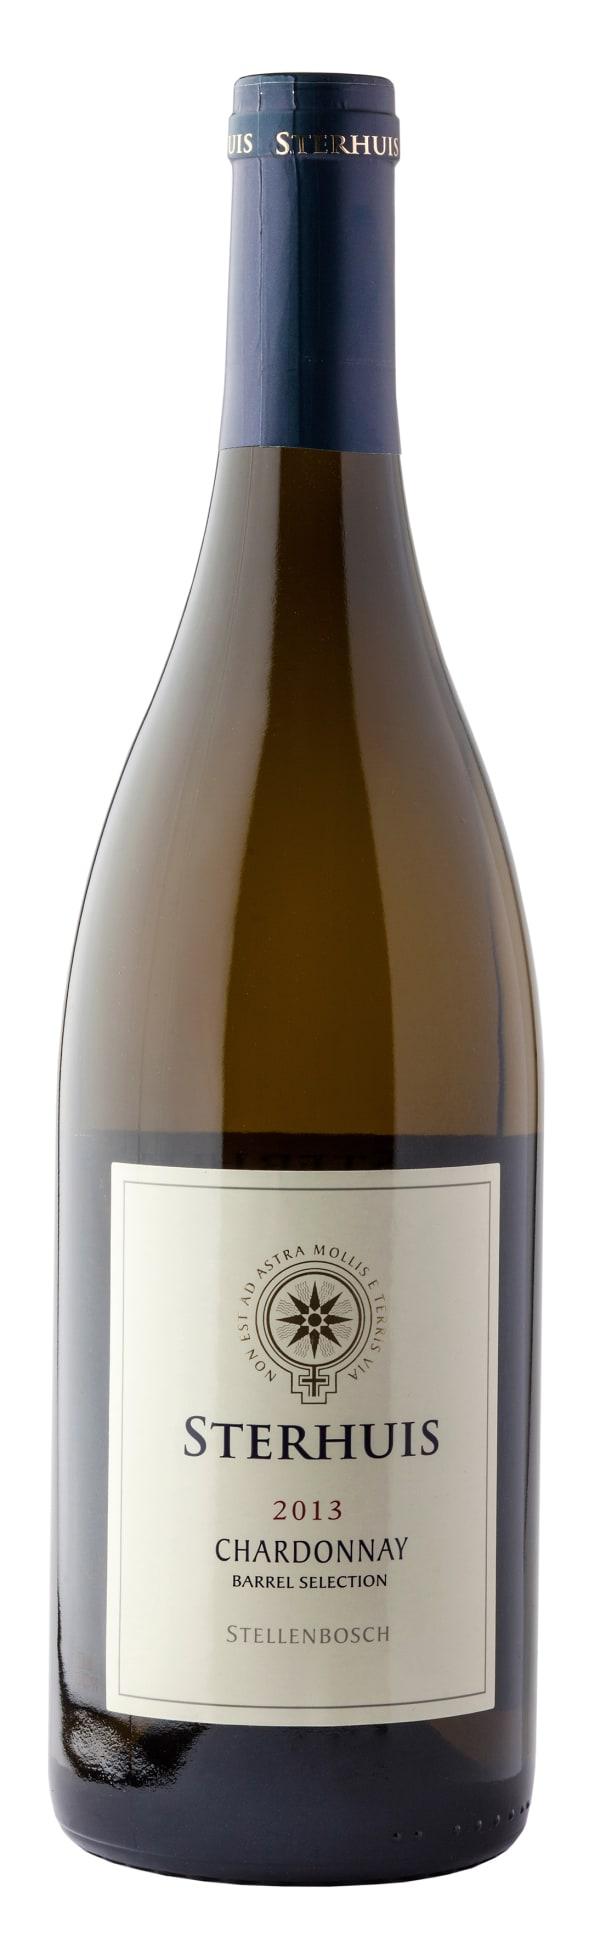 Sterhuis Chardonnay Barrel Selection 2015